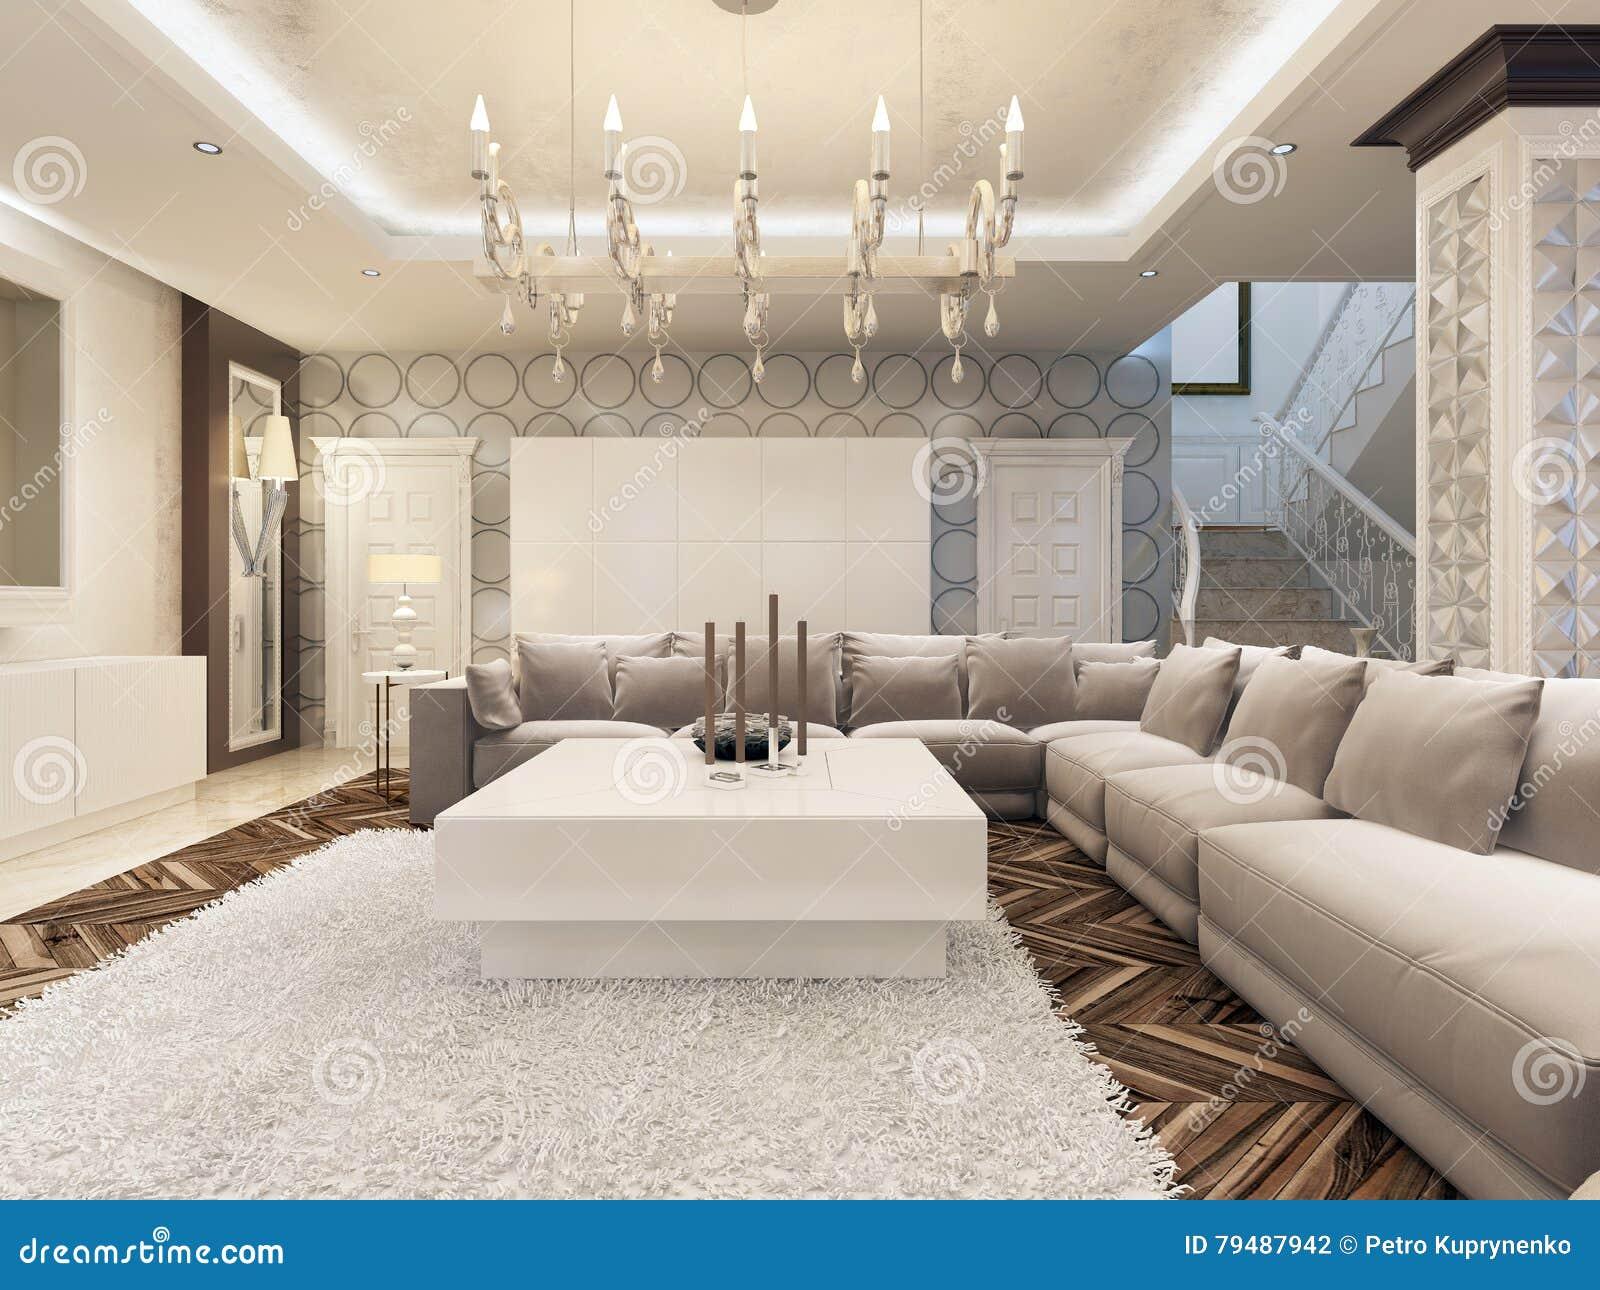 https://thumbs.dreamstime.com/z/het-ontwerp-heldere-woonkamer-van-het-luxeart-deco-met-grote-hoekbank-79487942.jpg